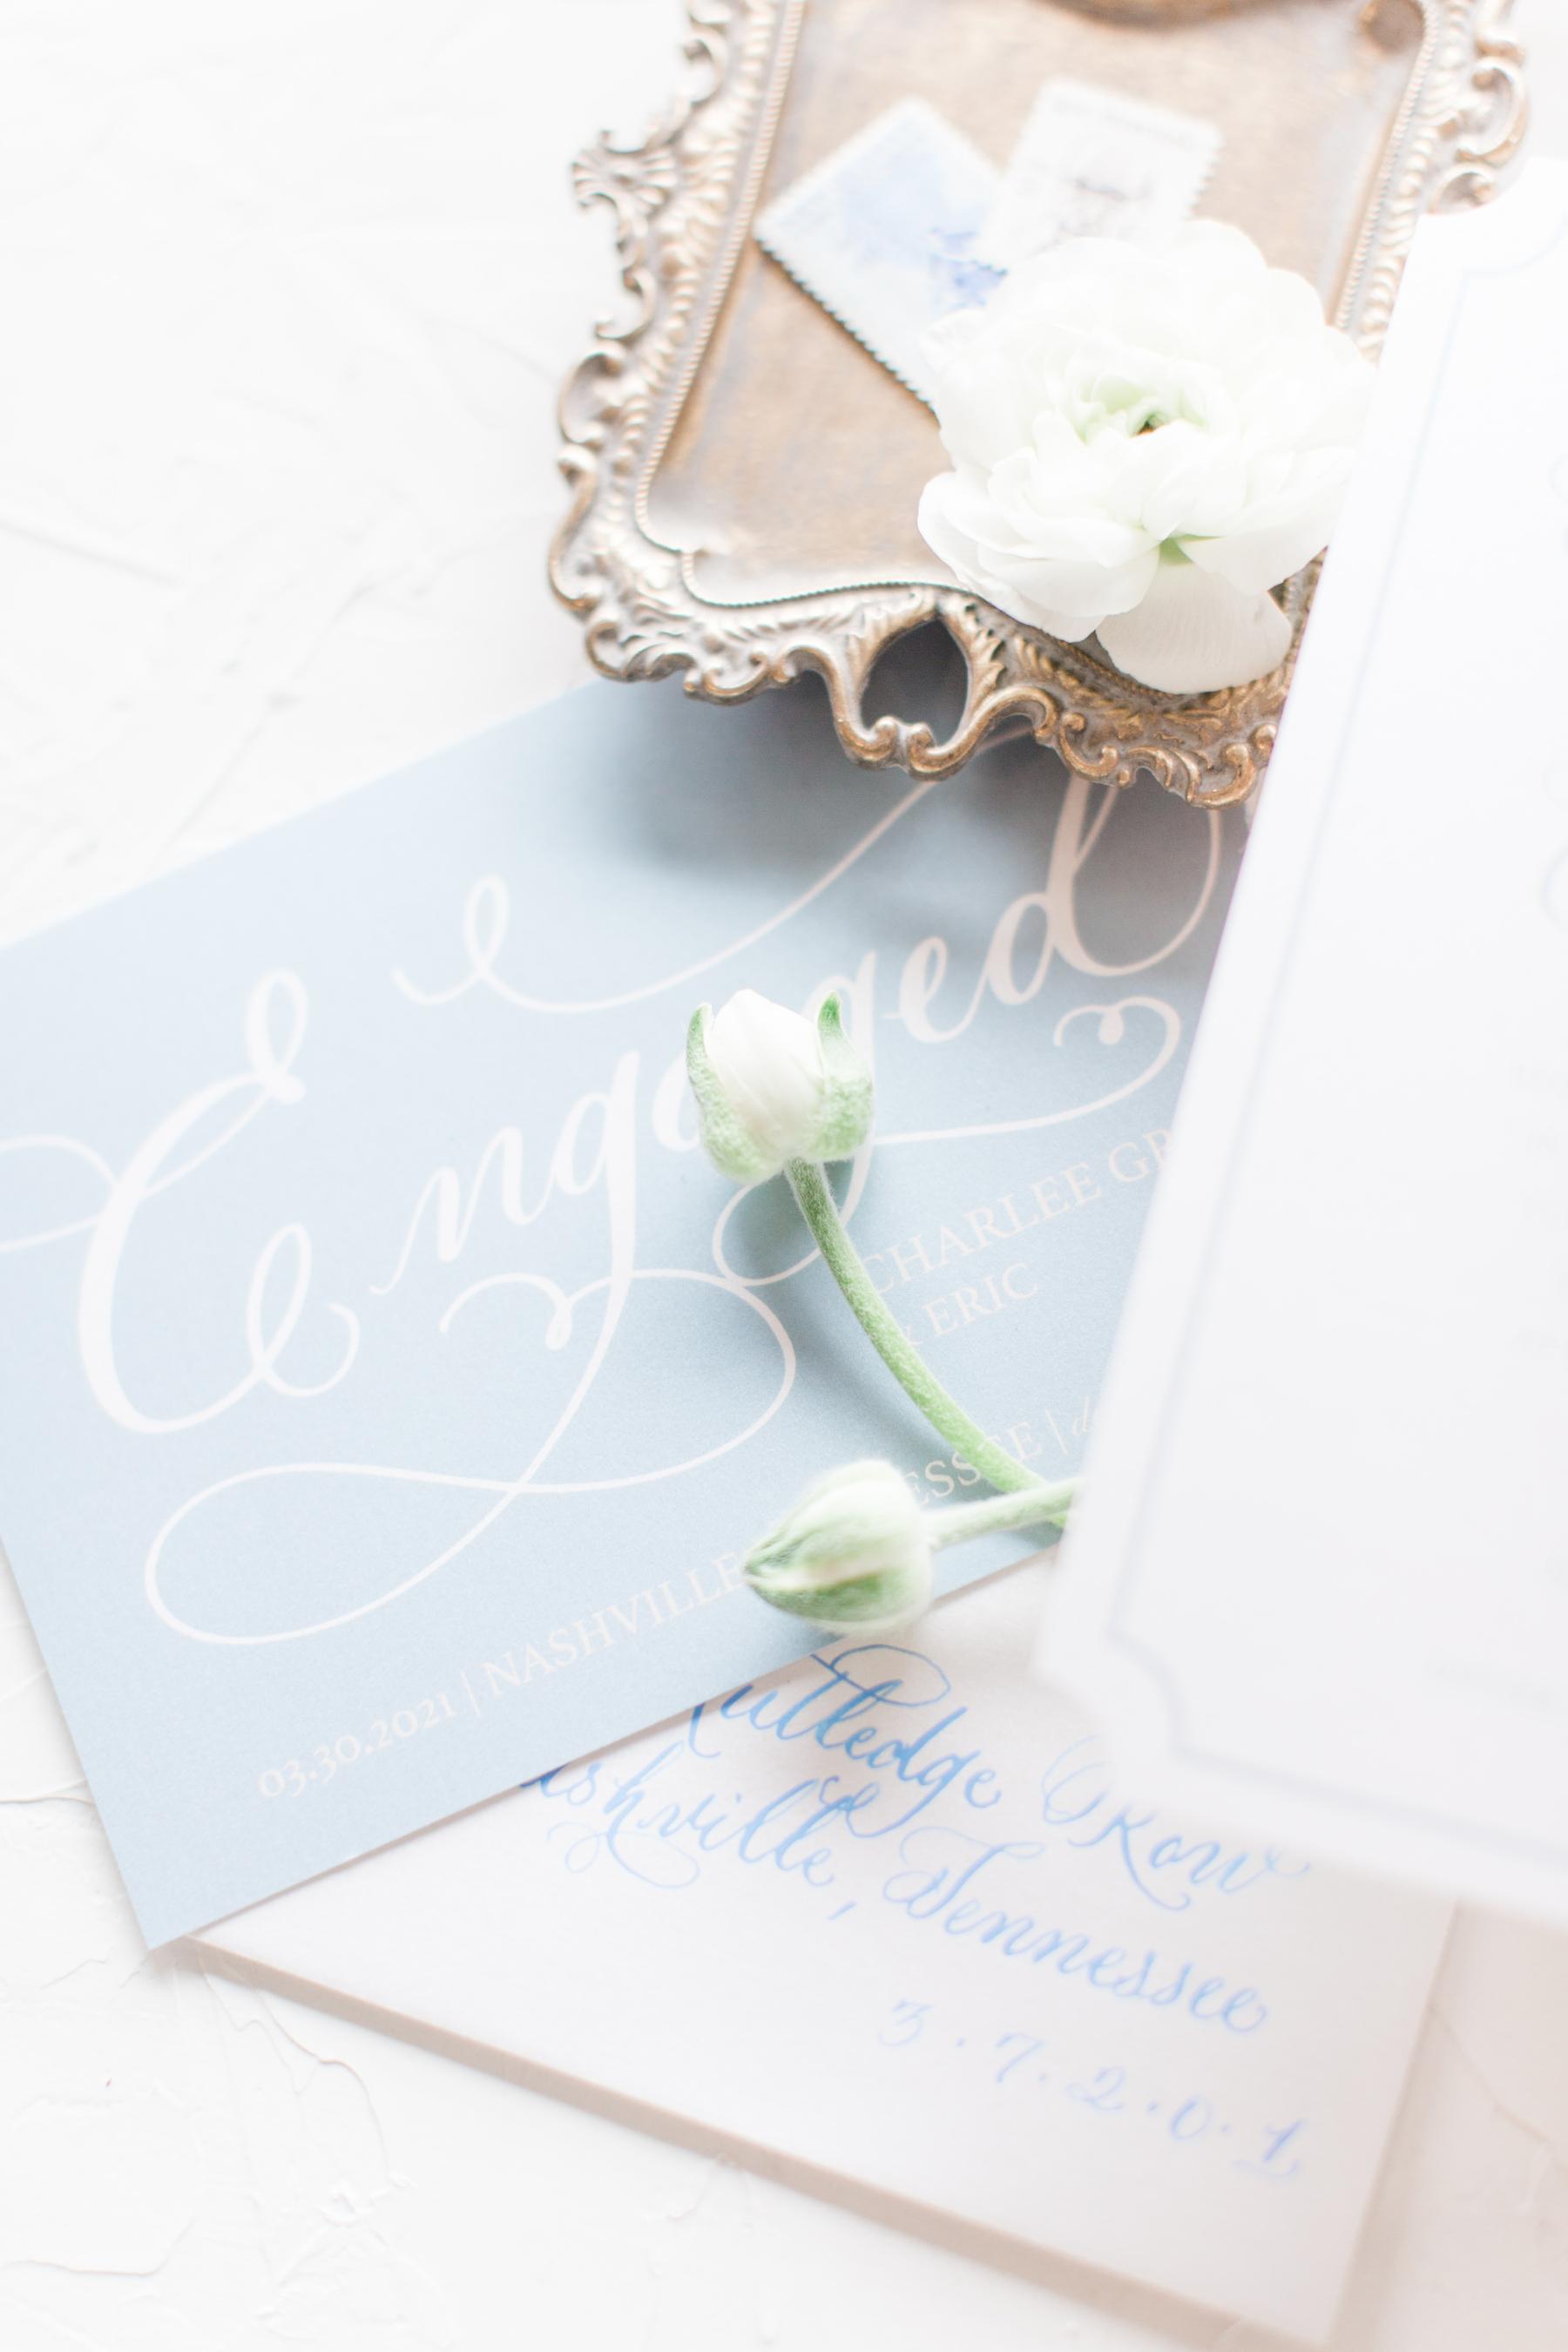 White and blue wedding invitation design